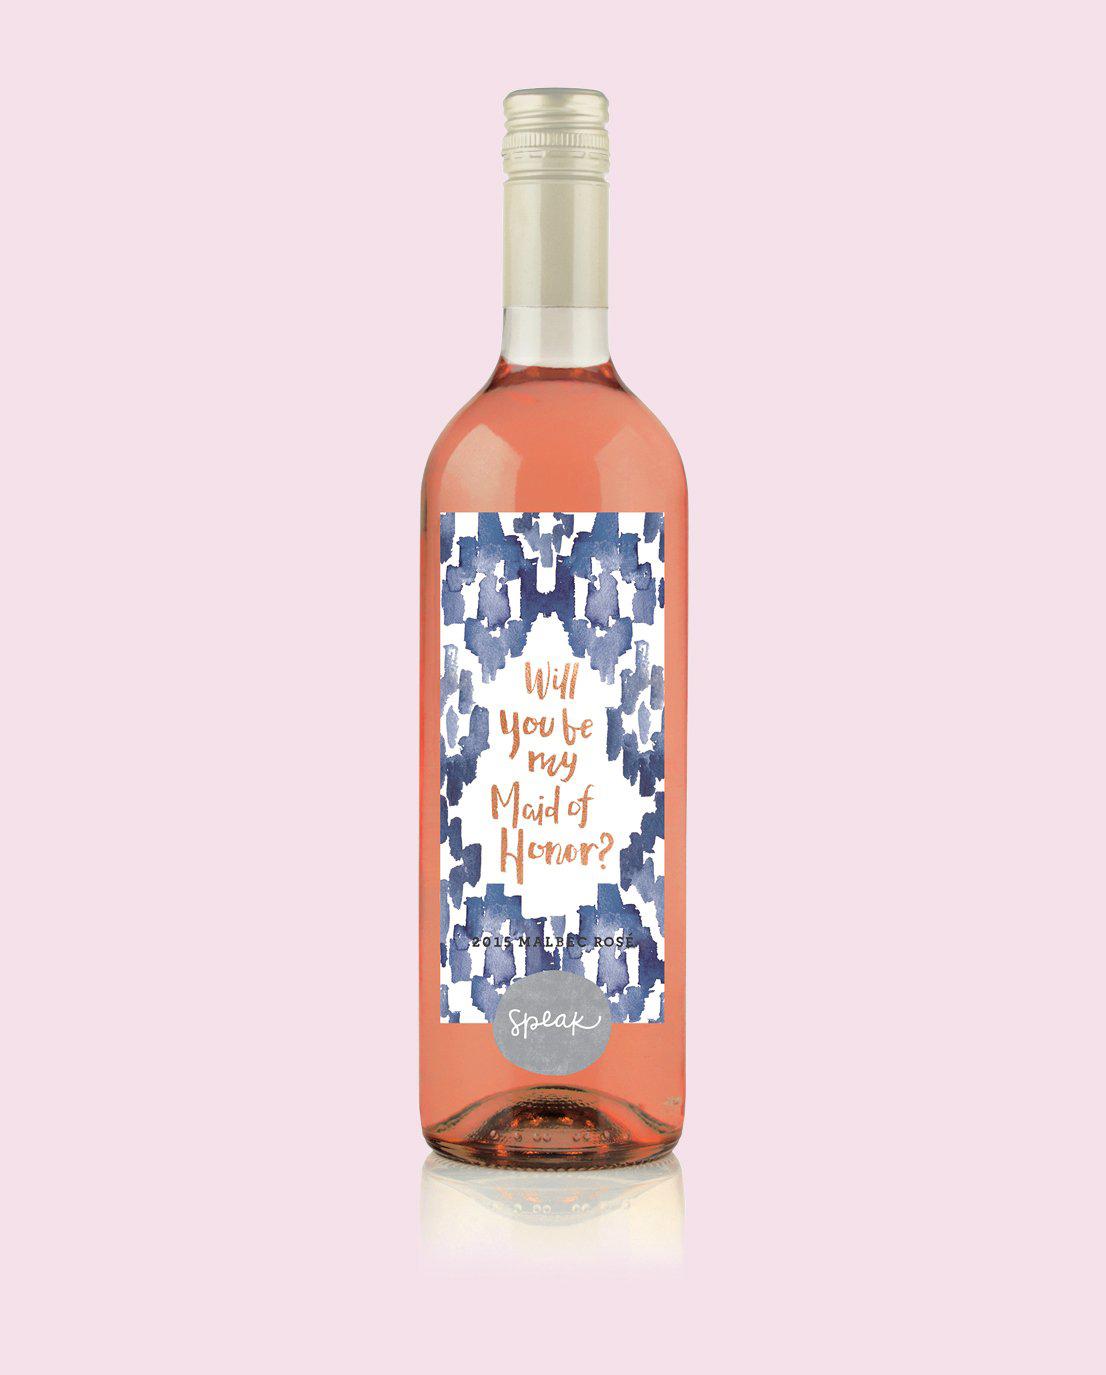 maid of honor proposal speak wine rose